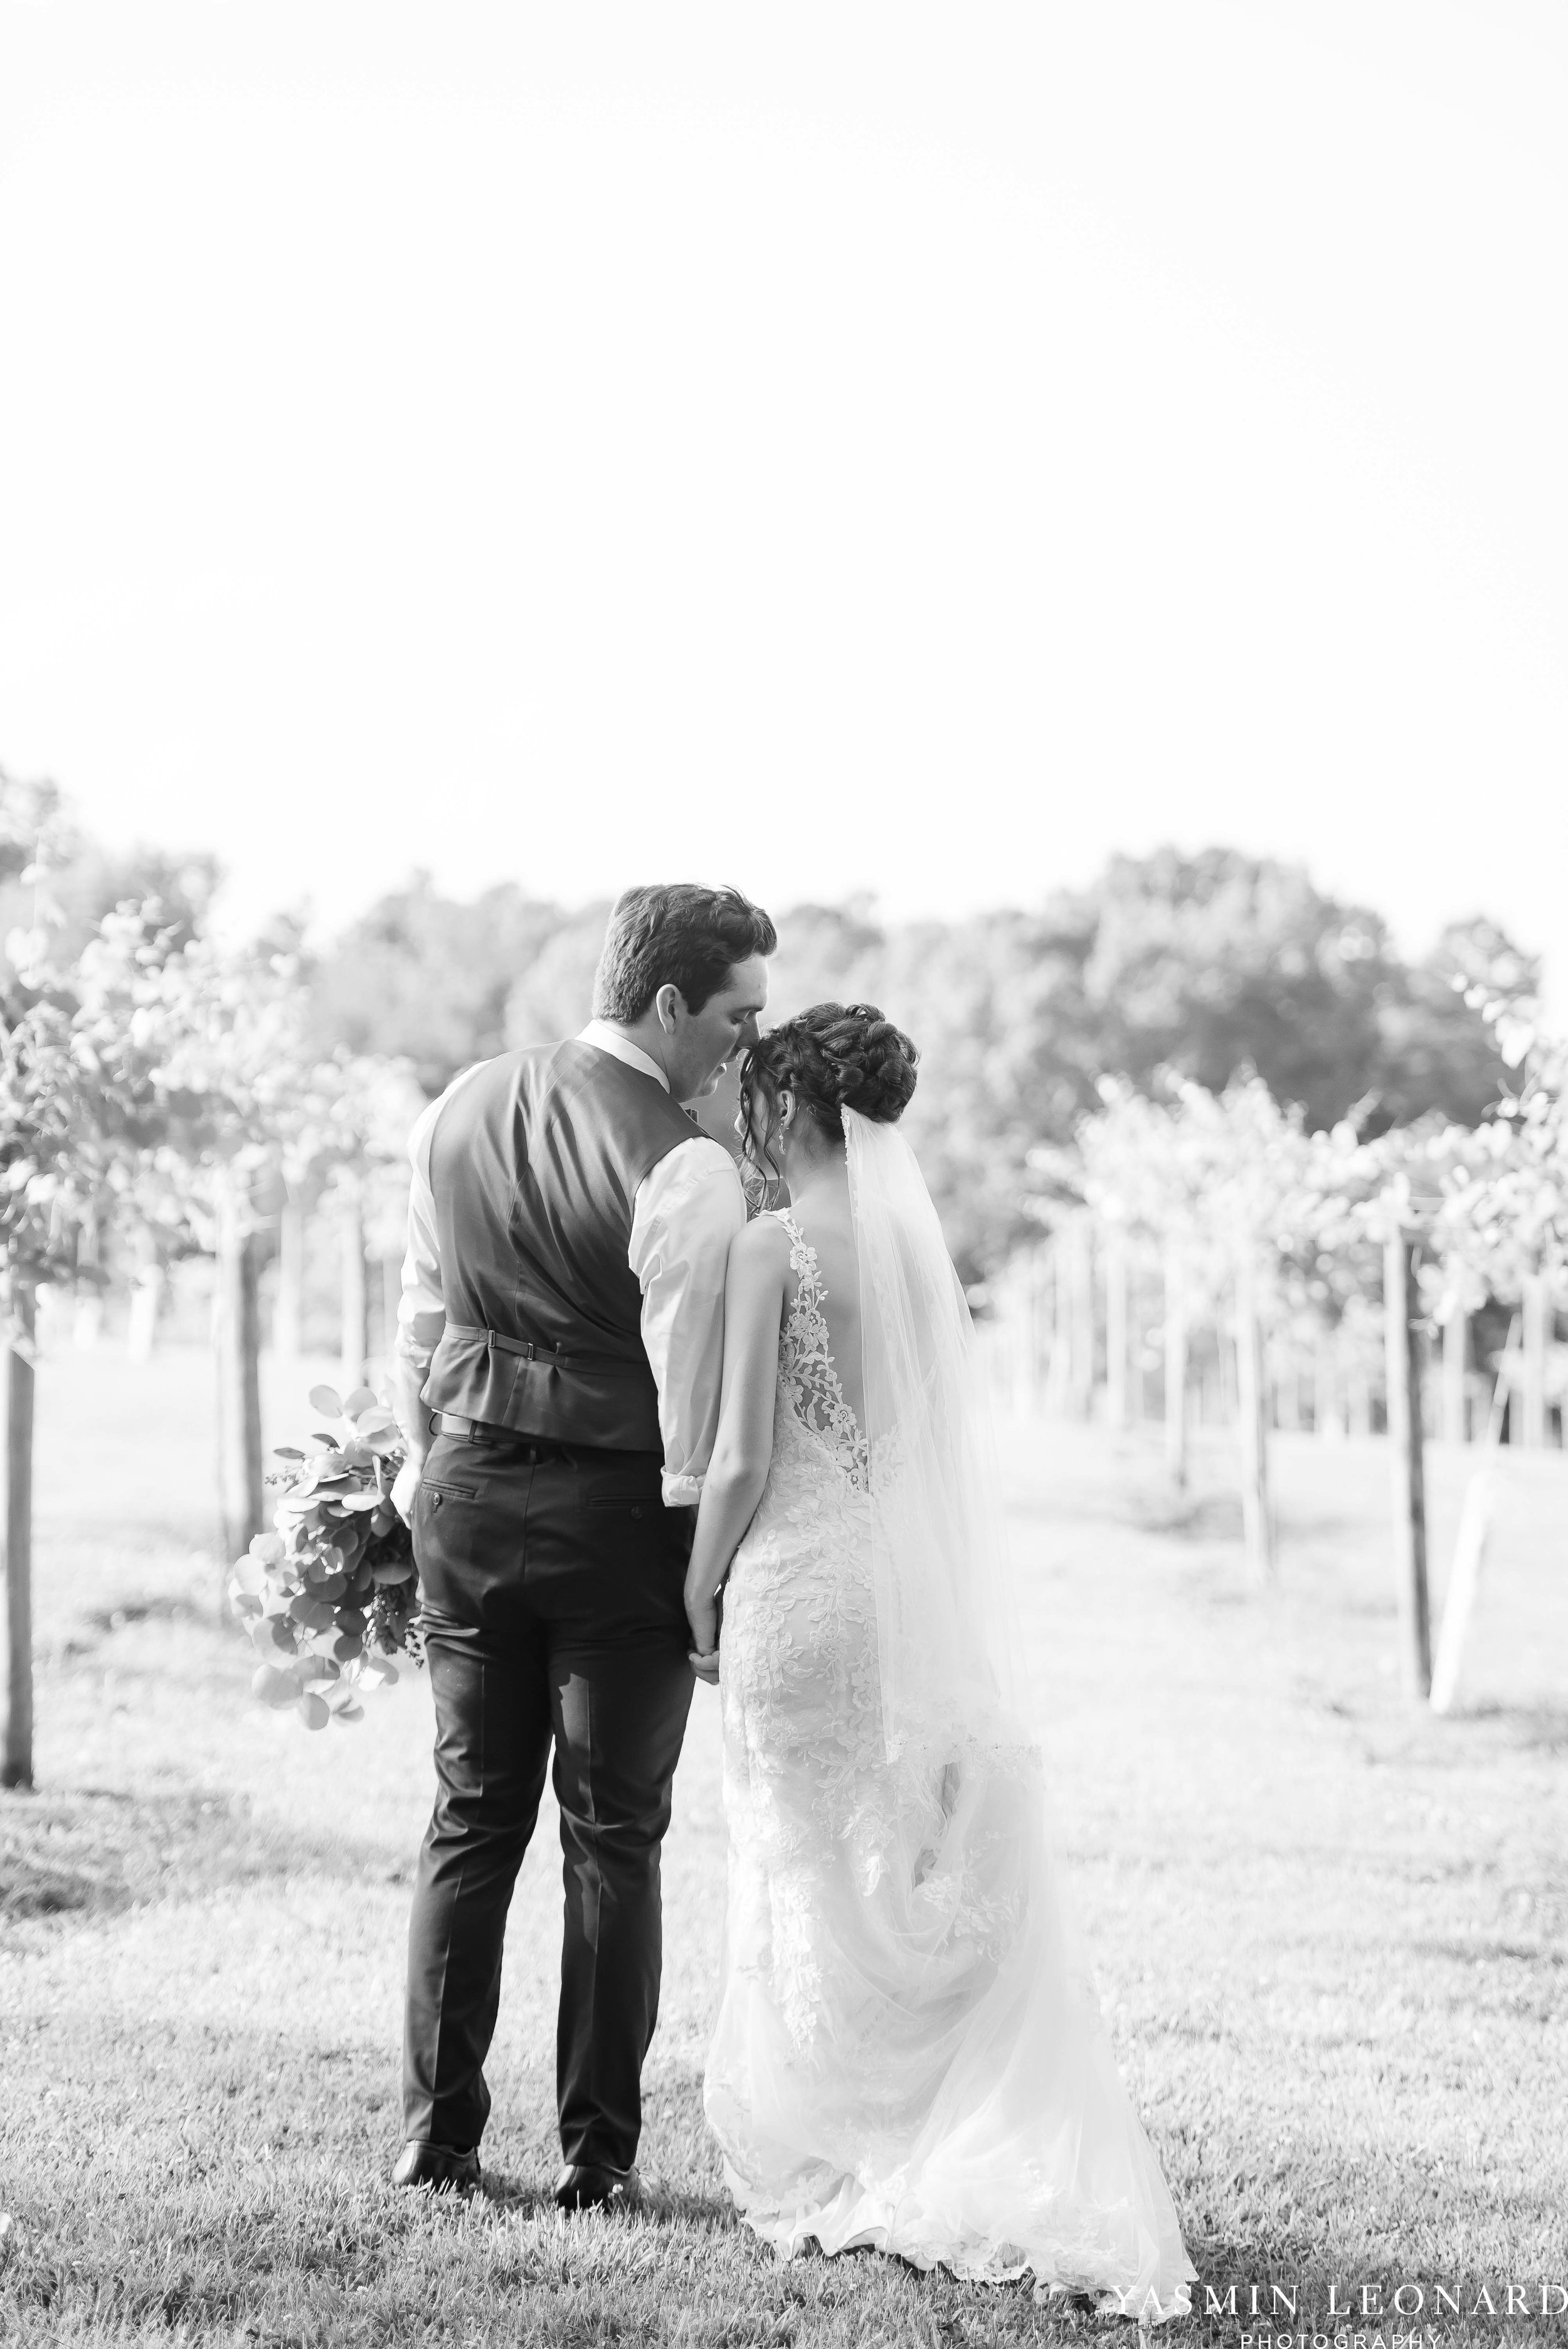 Old Homeplace Vineyard - NC Weddings - Outdoor Summer Weddings - Peony Boutique - Vineyard Wedding - NC Photographer - Yasmin Leonard Photography-44.jpg